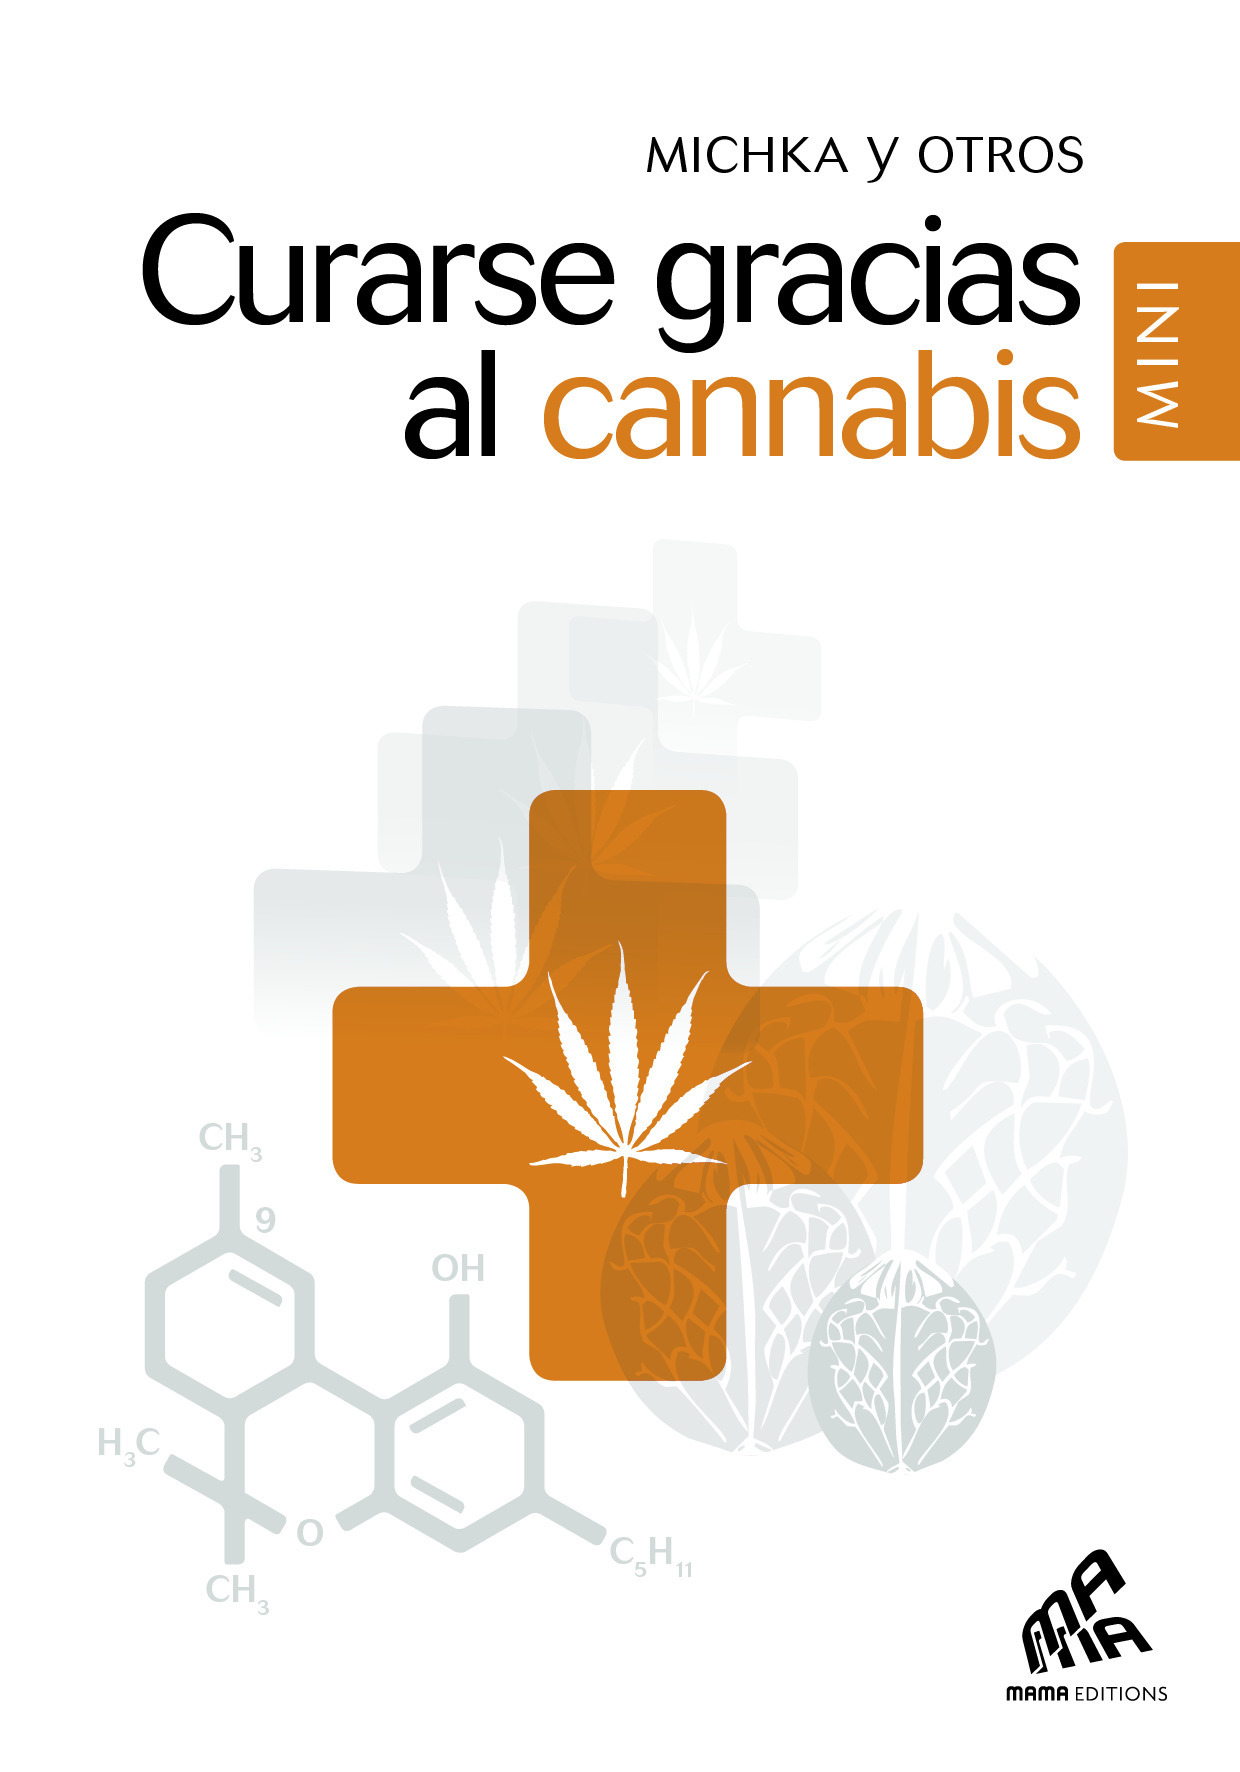 Curarse gracias al cannabis - Mini Edition